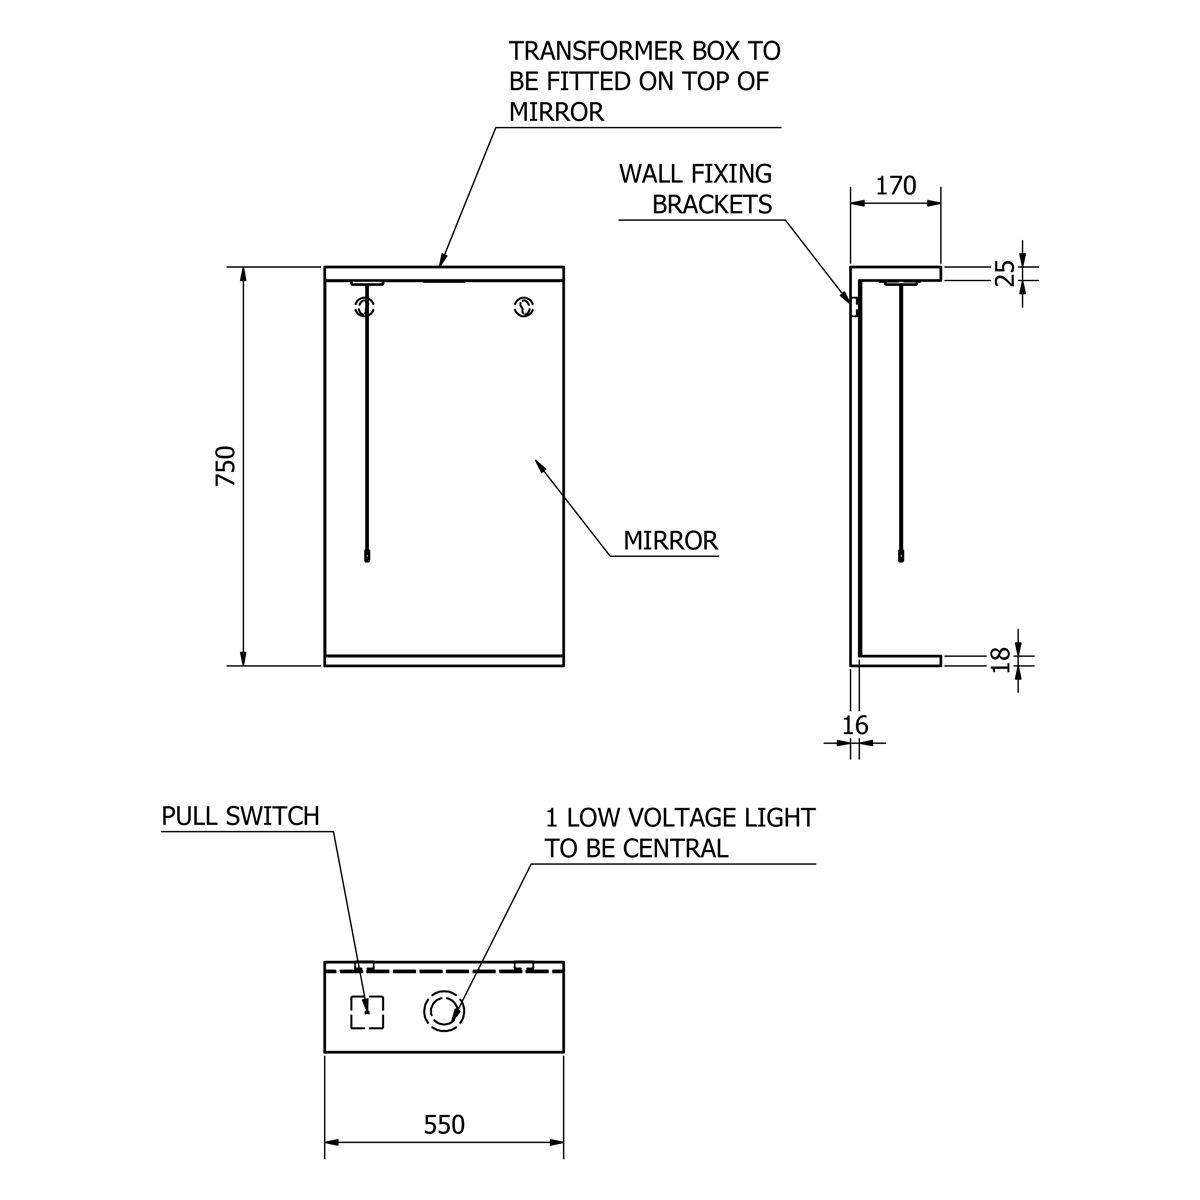 Kartell Impakt Mirror and Light 550mm Dimensions